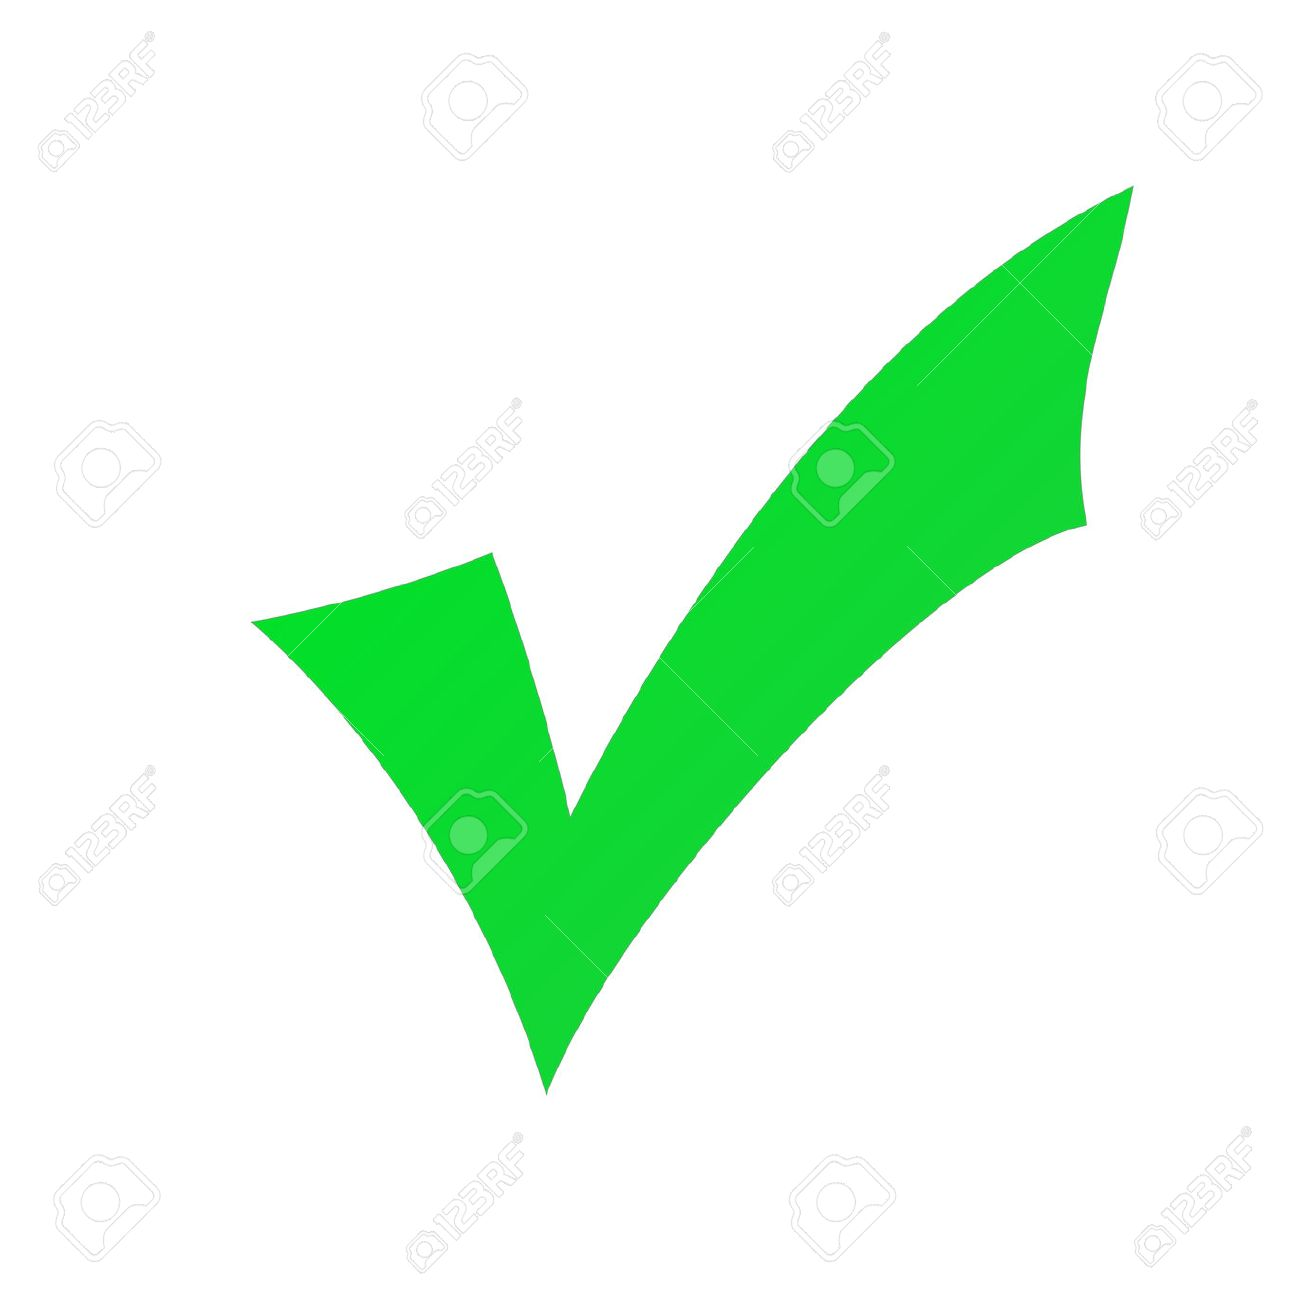 1300x1300 Green Check Mark. Transparent Green Checkmark Clip Art Check Mark